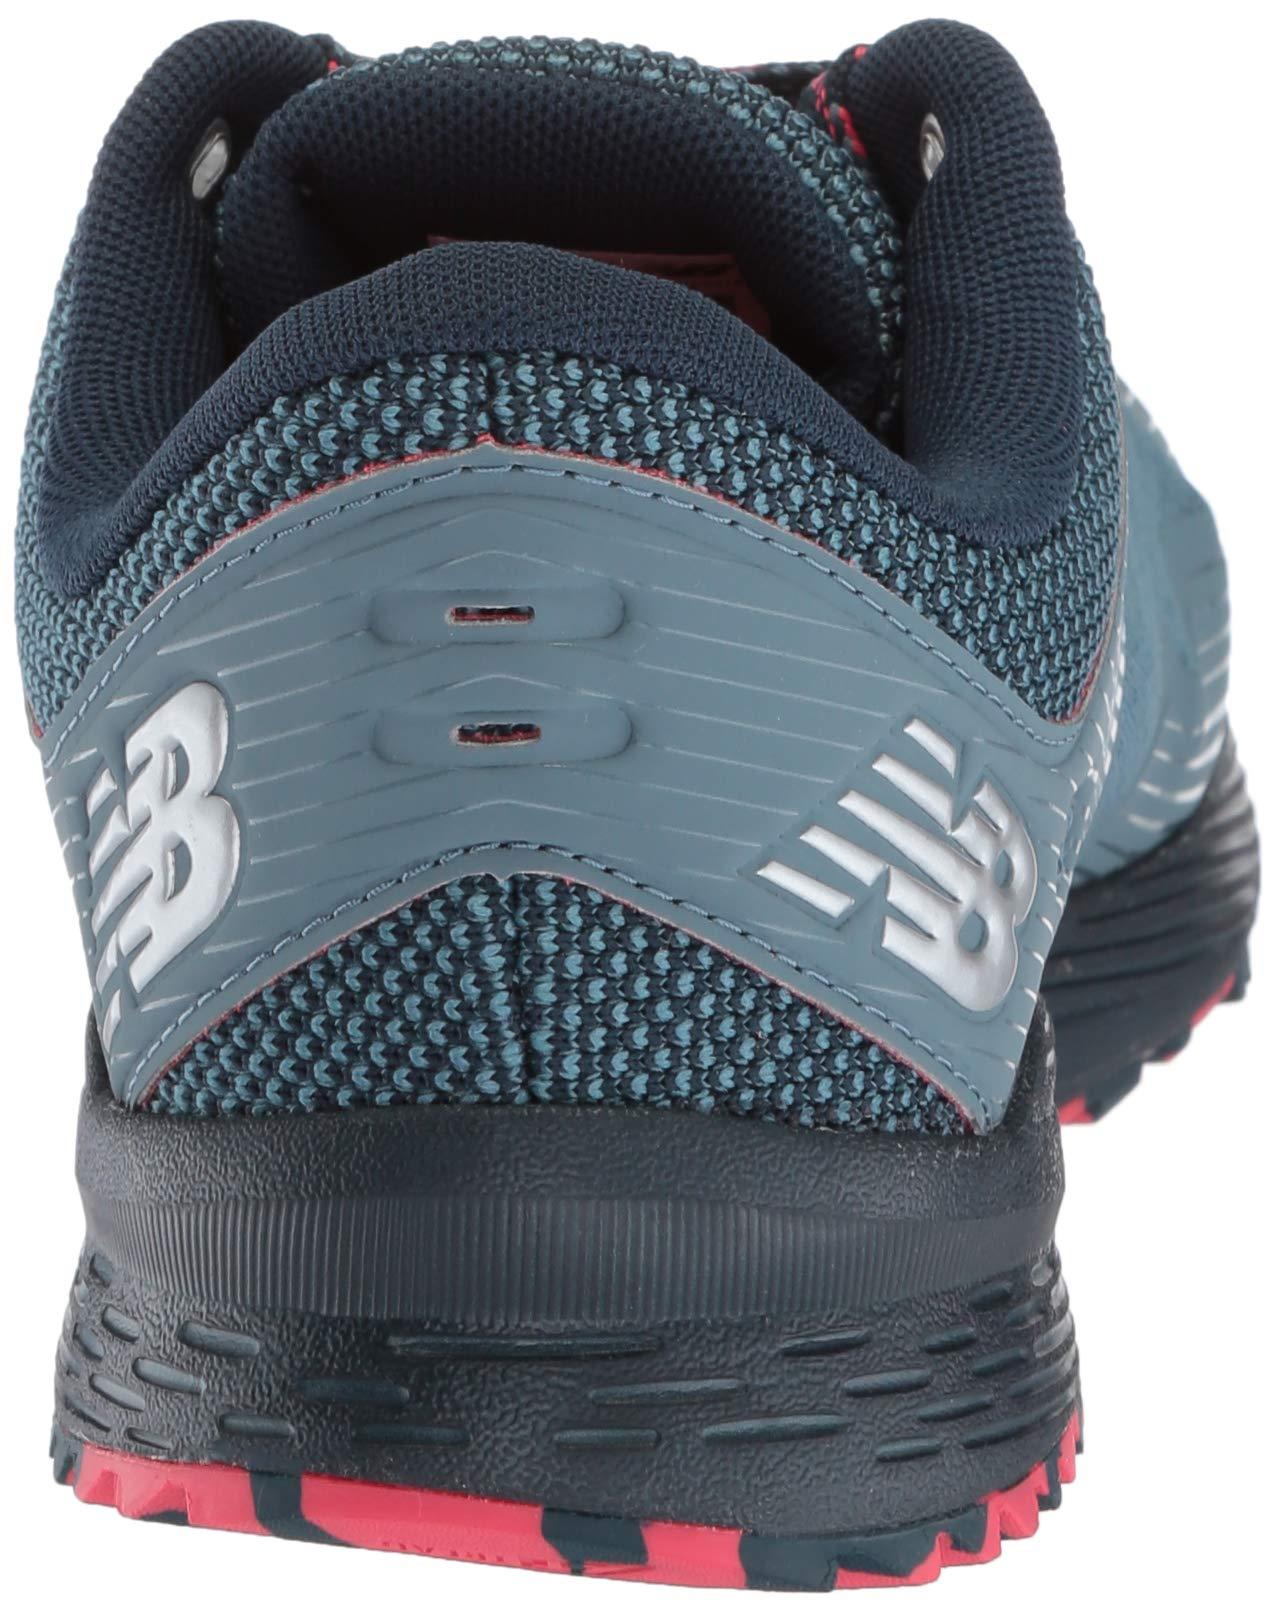 New Balance Women's Nitrel V2 FuelCore Trail Running Shoe Light Petrol/Galaxy/Blossom 6 B US by New Balance (Image #2)